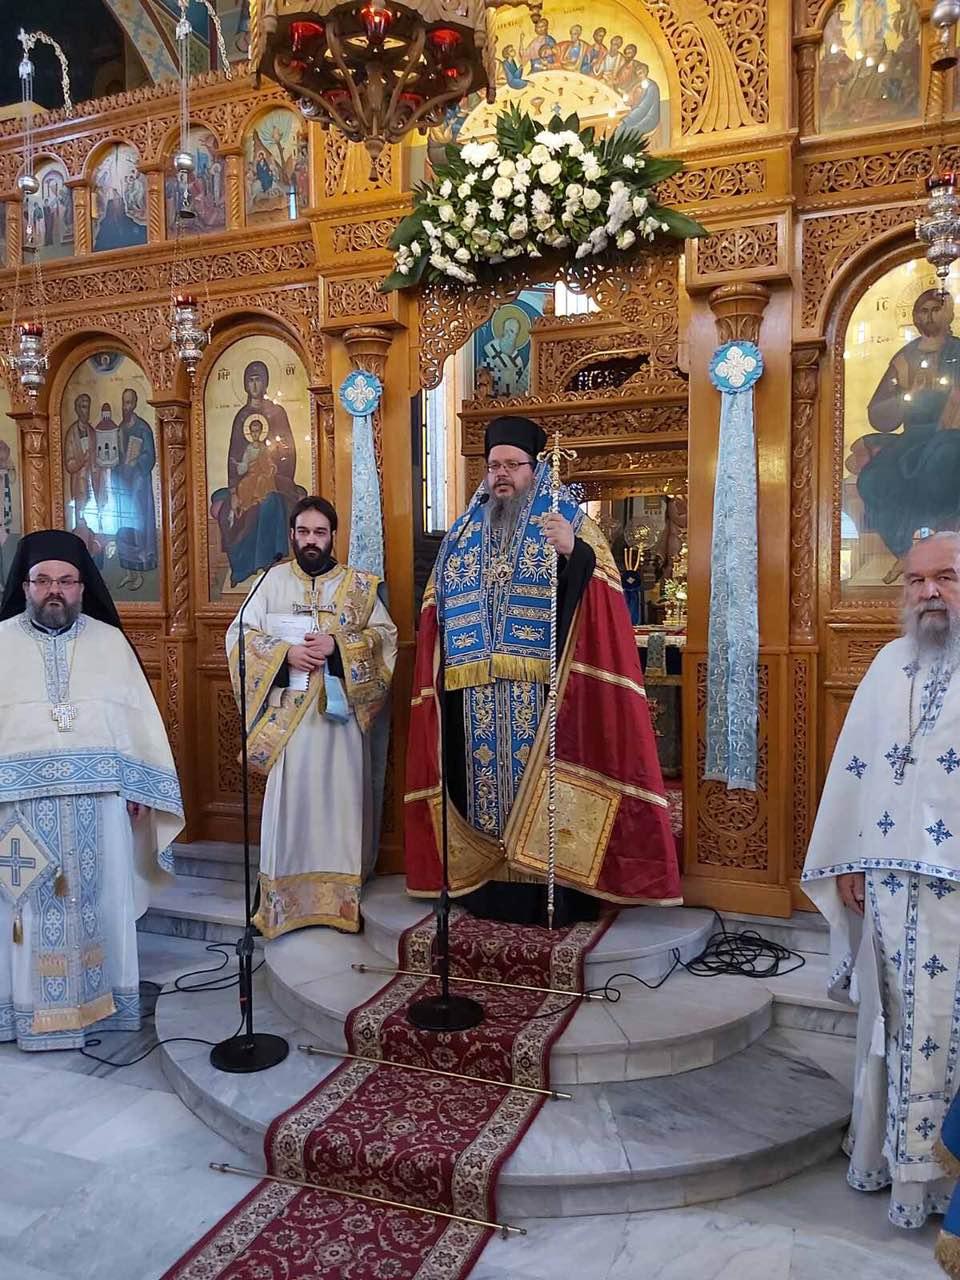 doksologia AgArtemiou 1 - Εορτή του Αγίου Αρτεμίου και της Ελληνικής Αστυνομίας